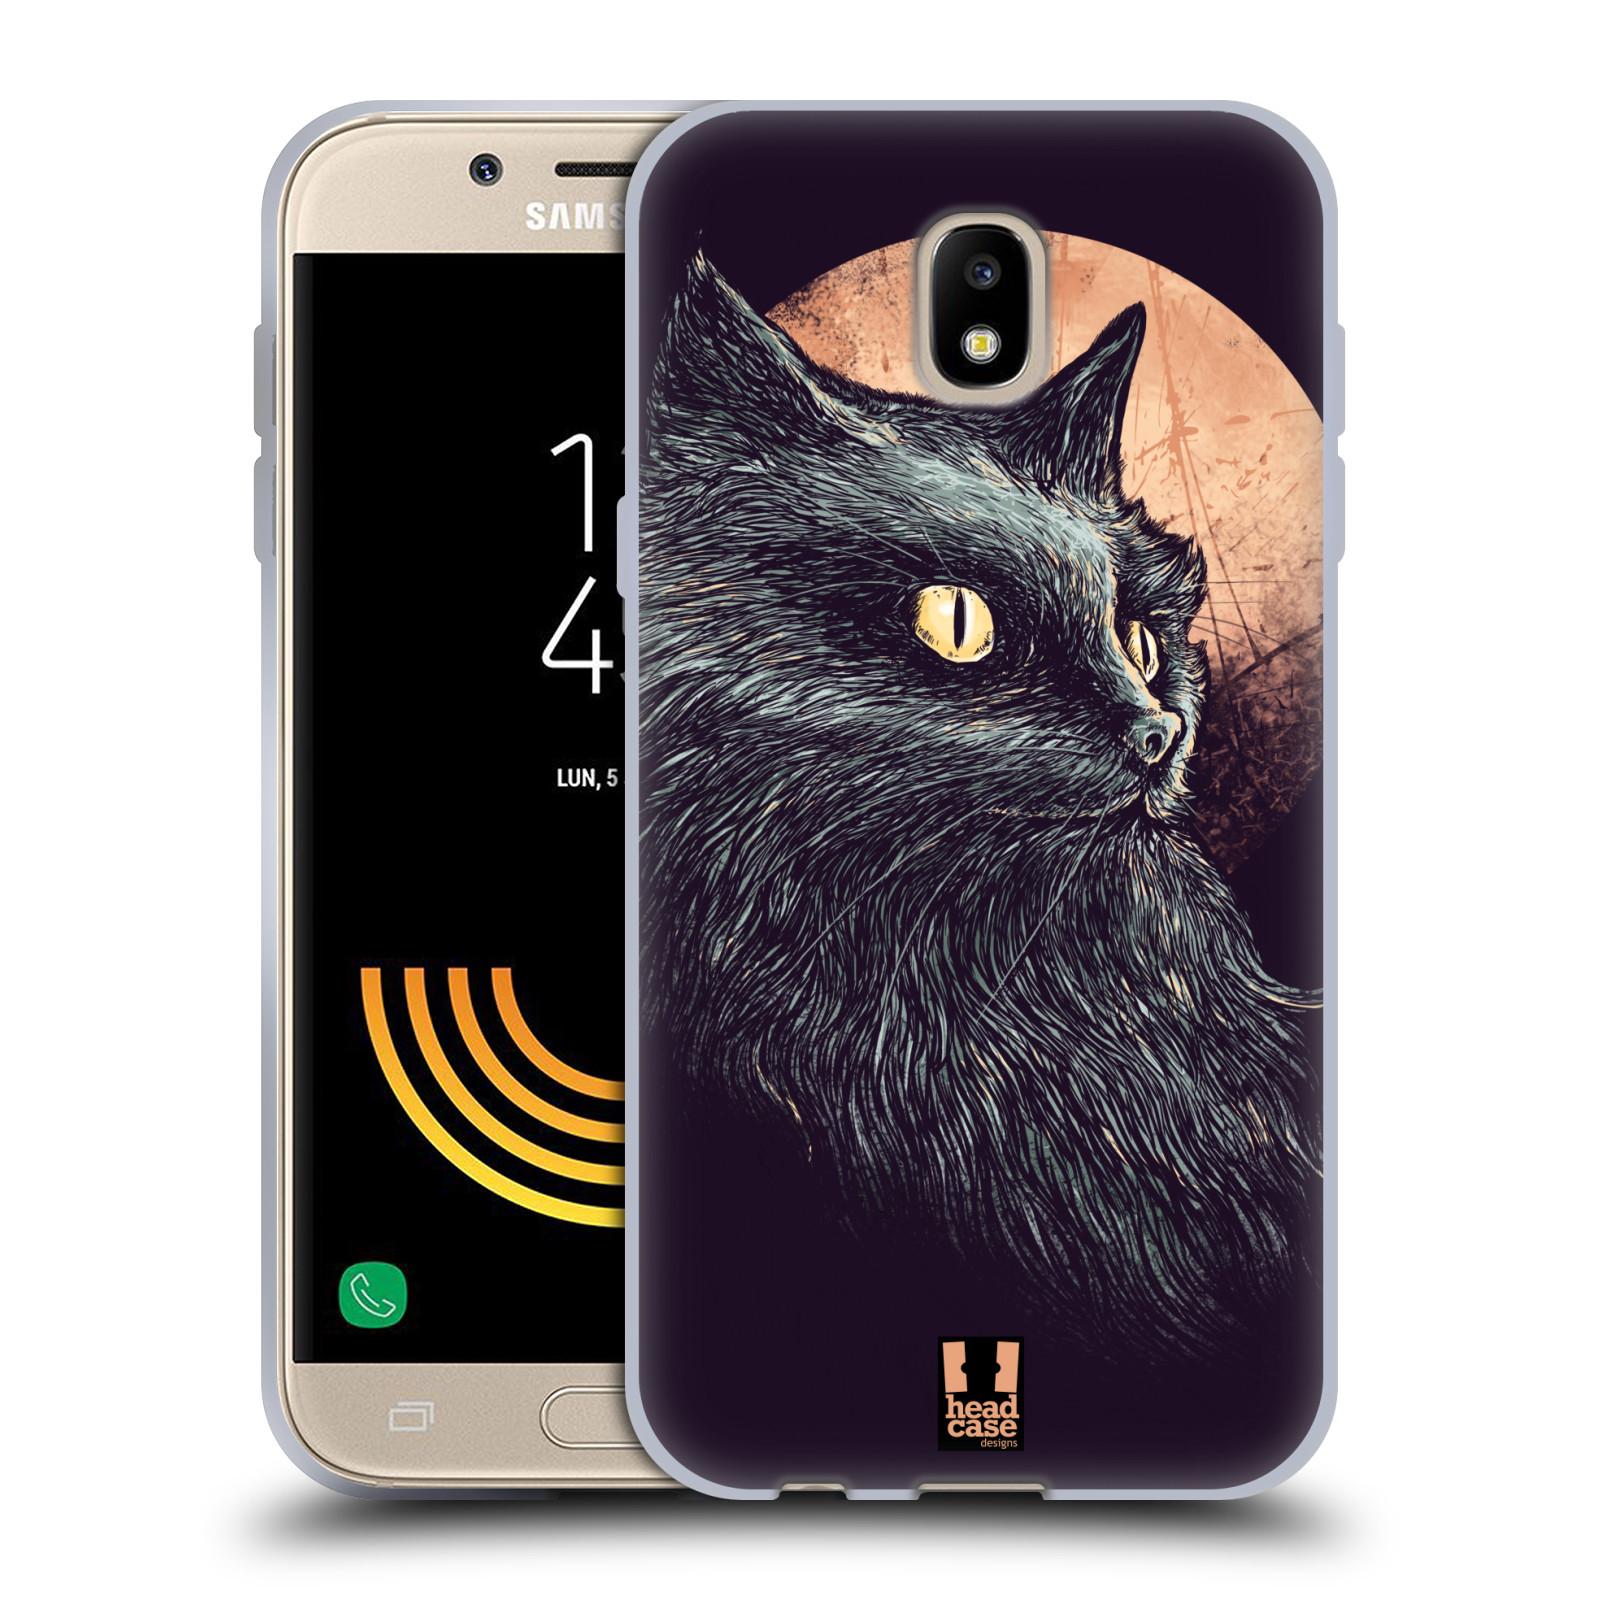 custodia samsung j5 2017 gatti